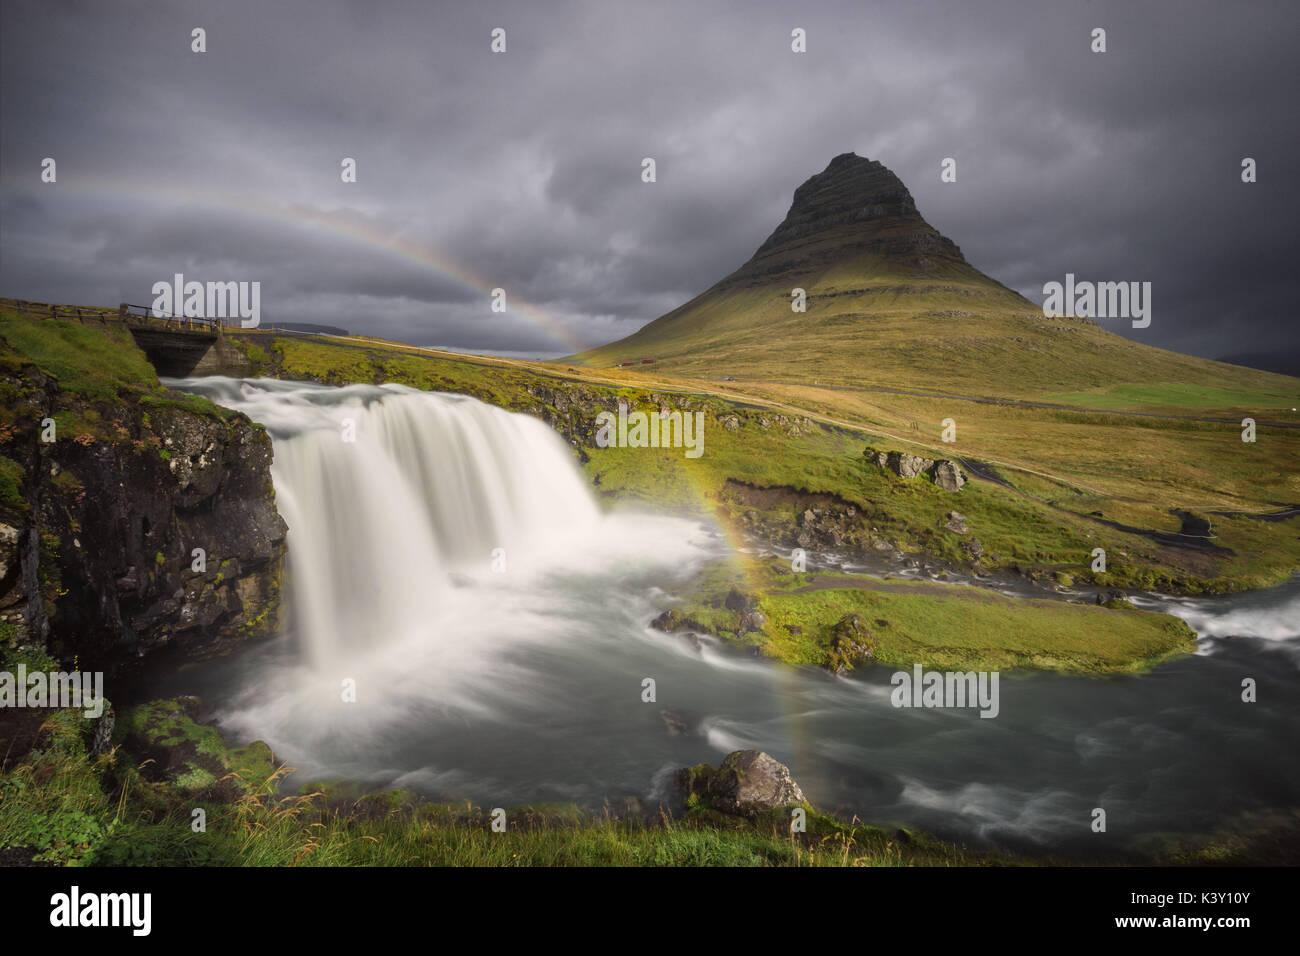 Kirkjufellsfoss view with a rainbow - Stock Image